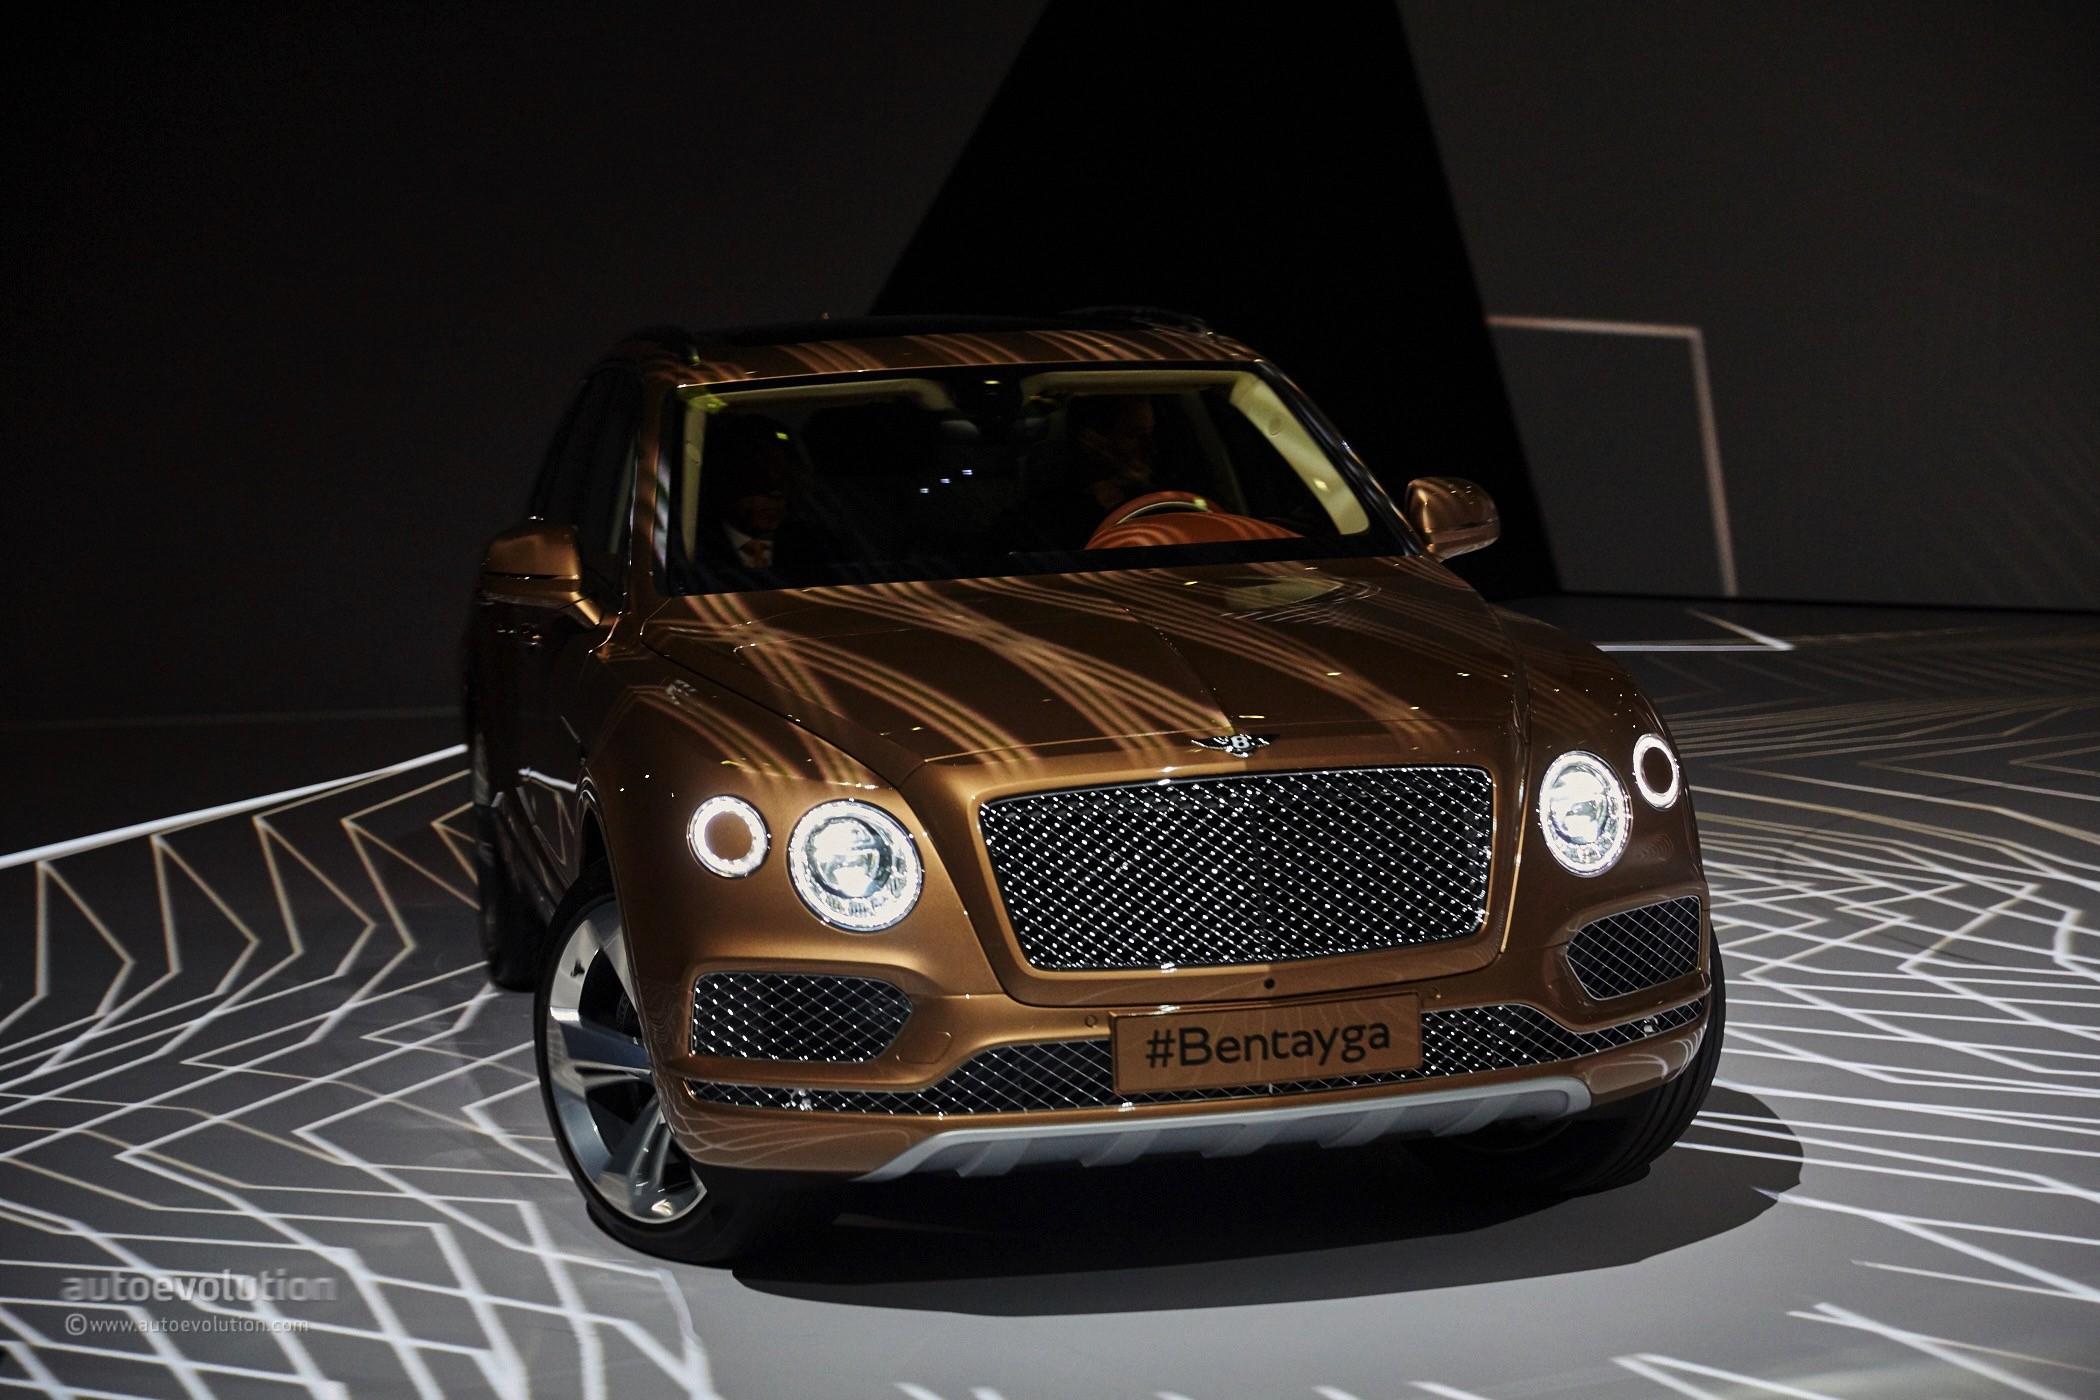 Bentley Bentayga Might Get the Same 4.0 TDI V8 with E-Turbo as Audi SQ7 - autoevolution